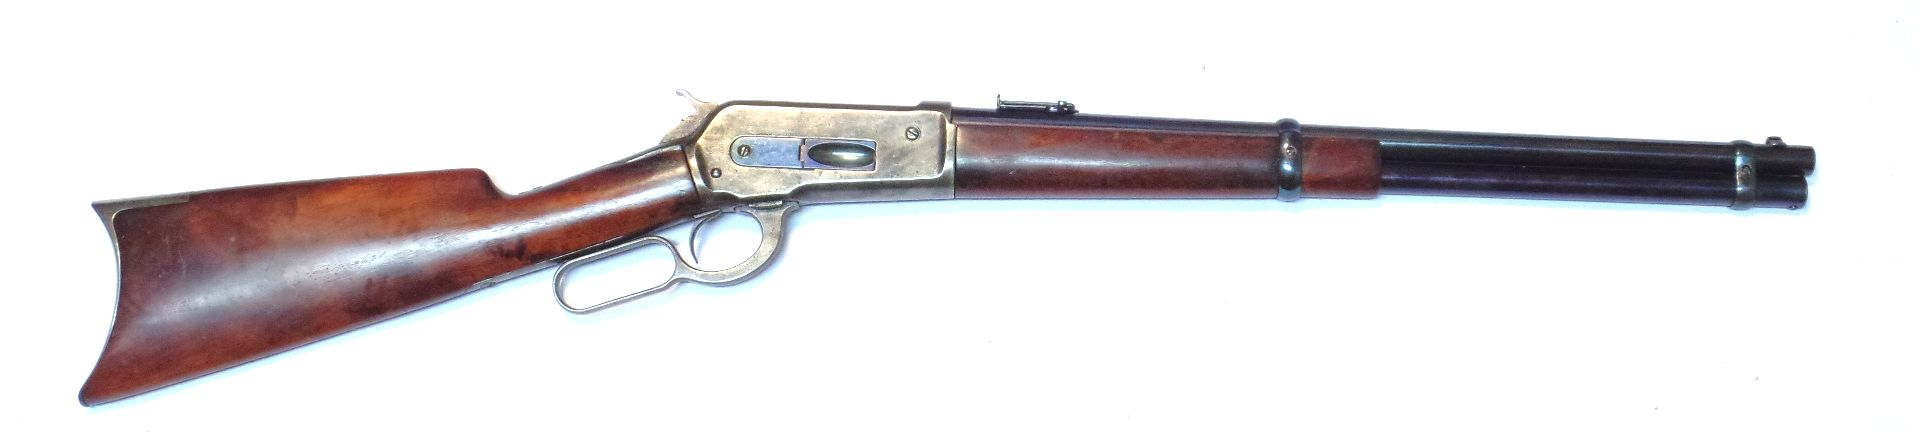 Winchester Saddle Carbine Originale 1886 calibre 38-56